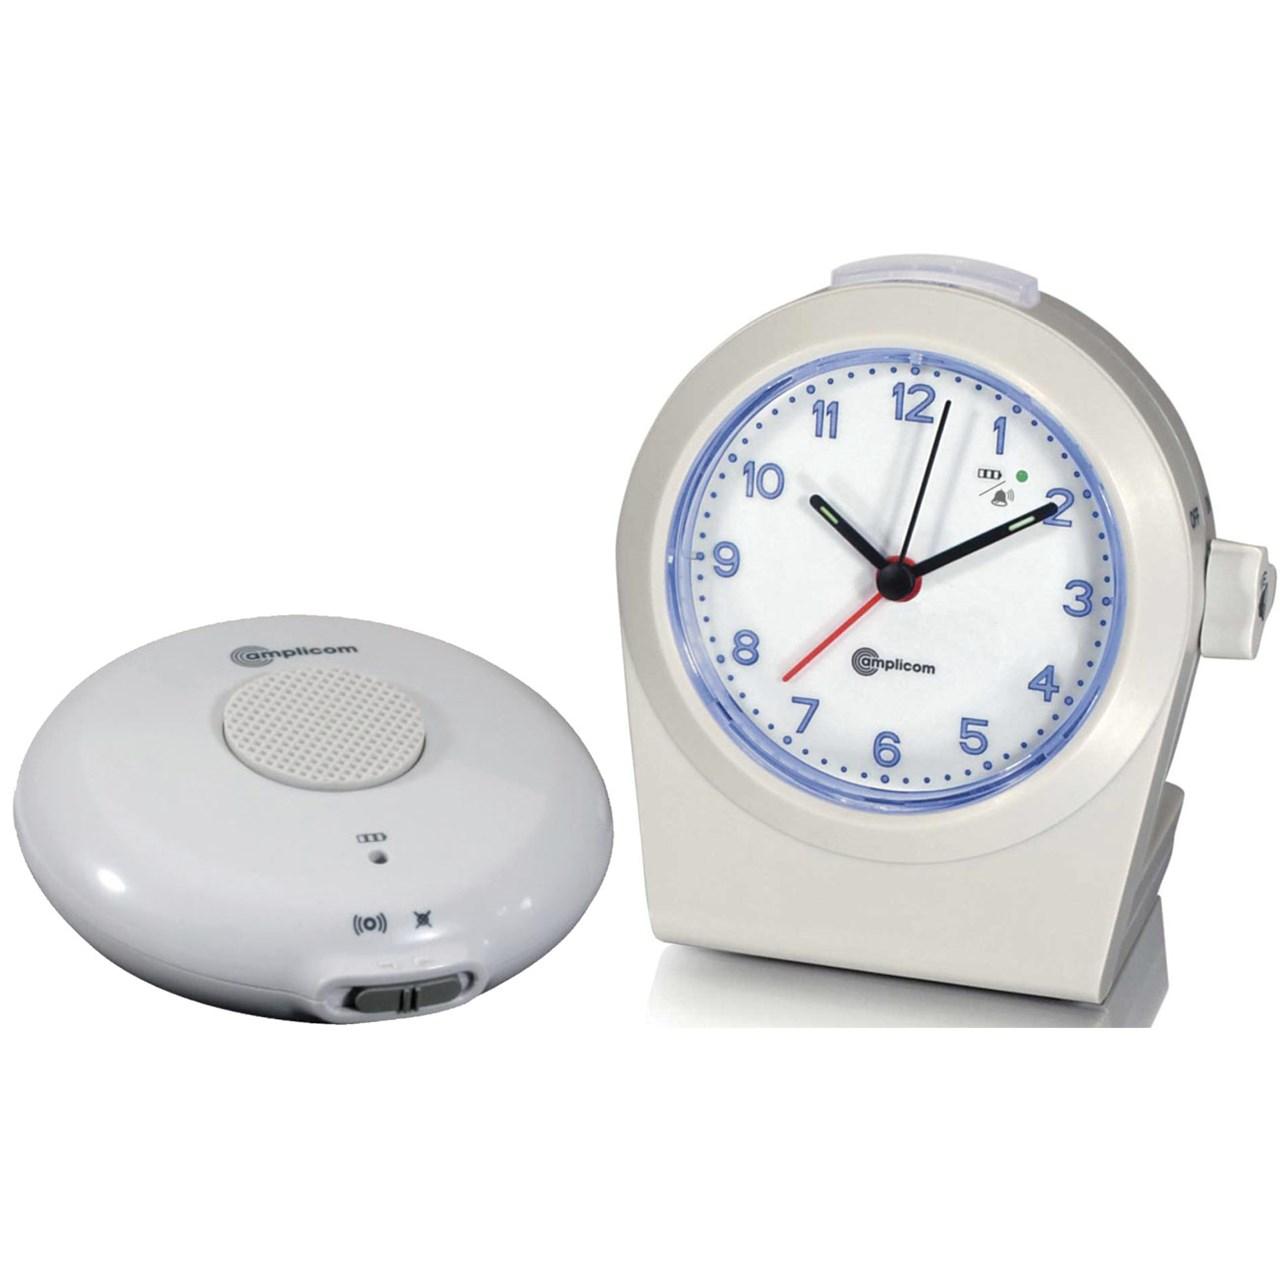 Amplicom Alarm Clock-Ring Signaler with Vibrator